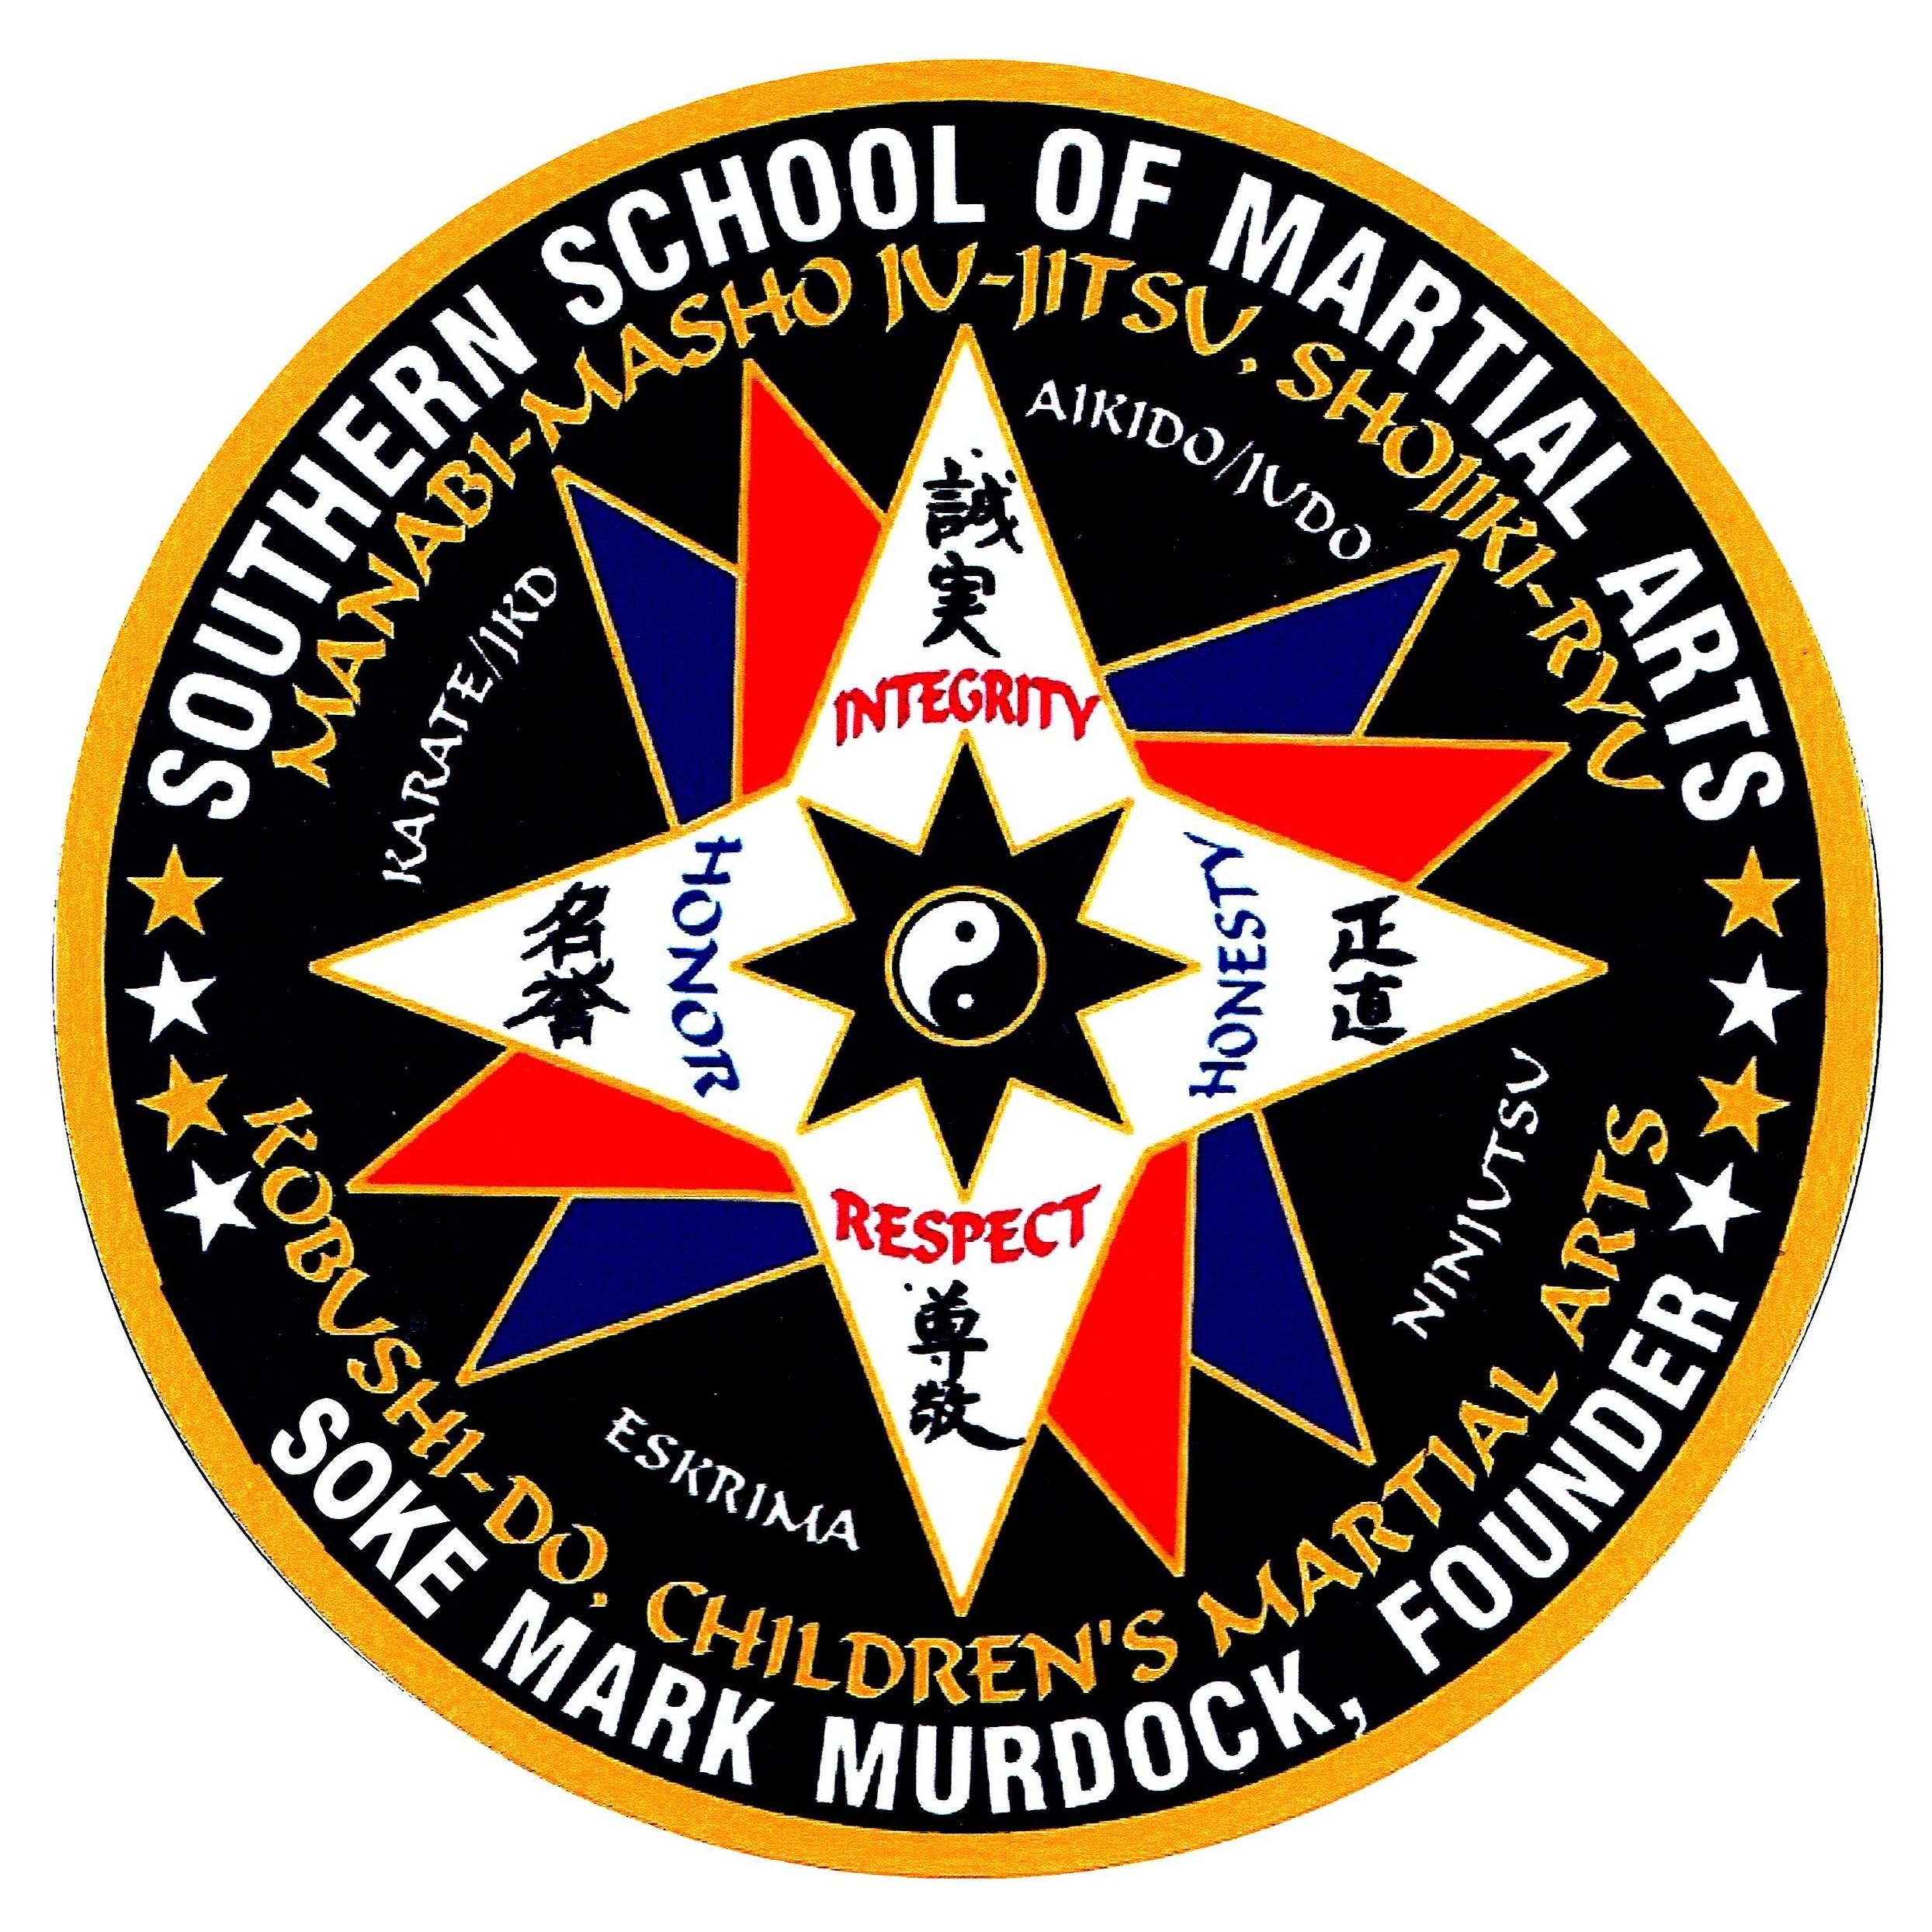 Southern School of Martial Arts and Rivers Edge Bujinkan Dojo, - Benson, NC - Martial Arts Instruction